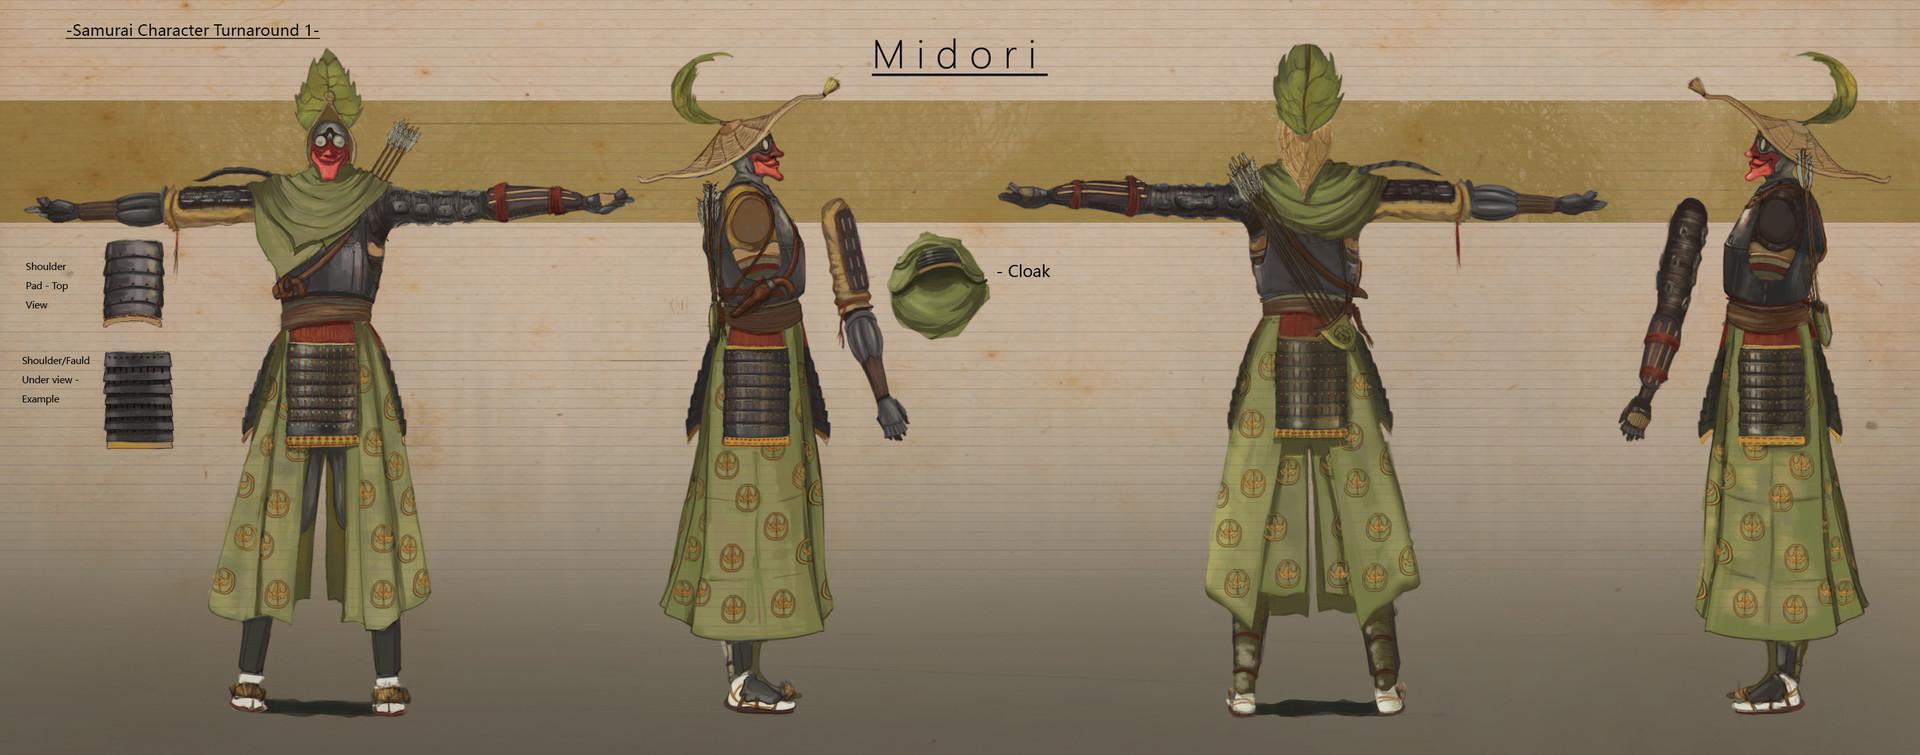 Concept Art Character Design Turnaround